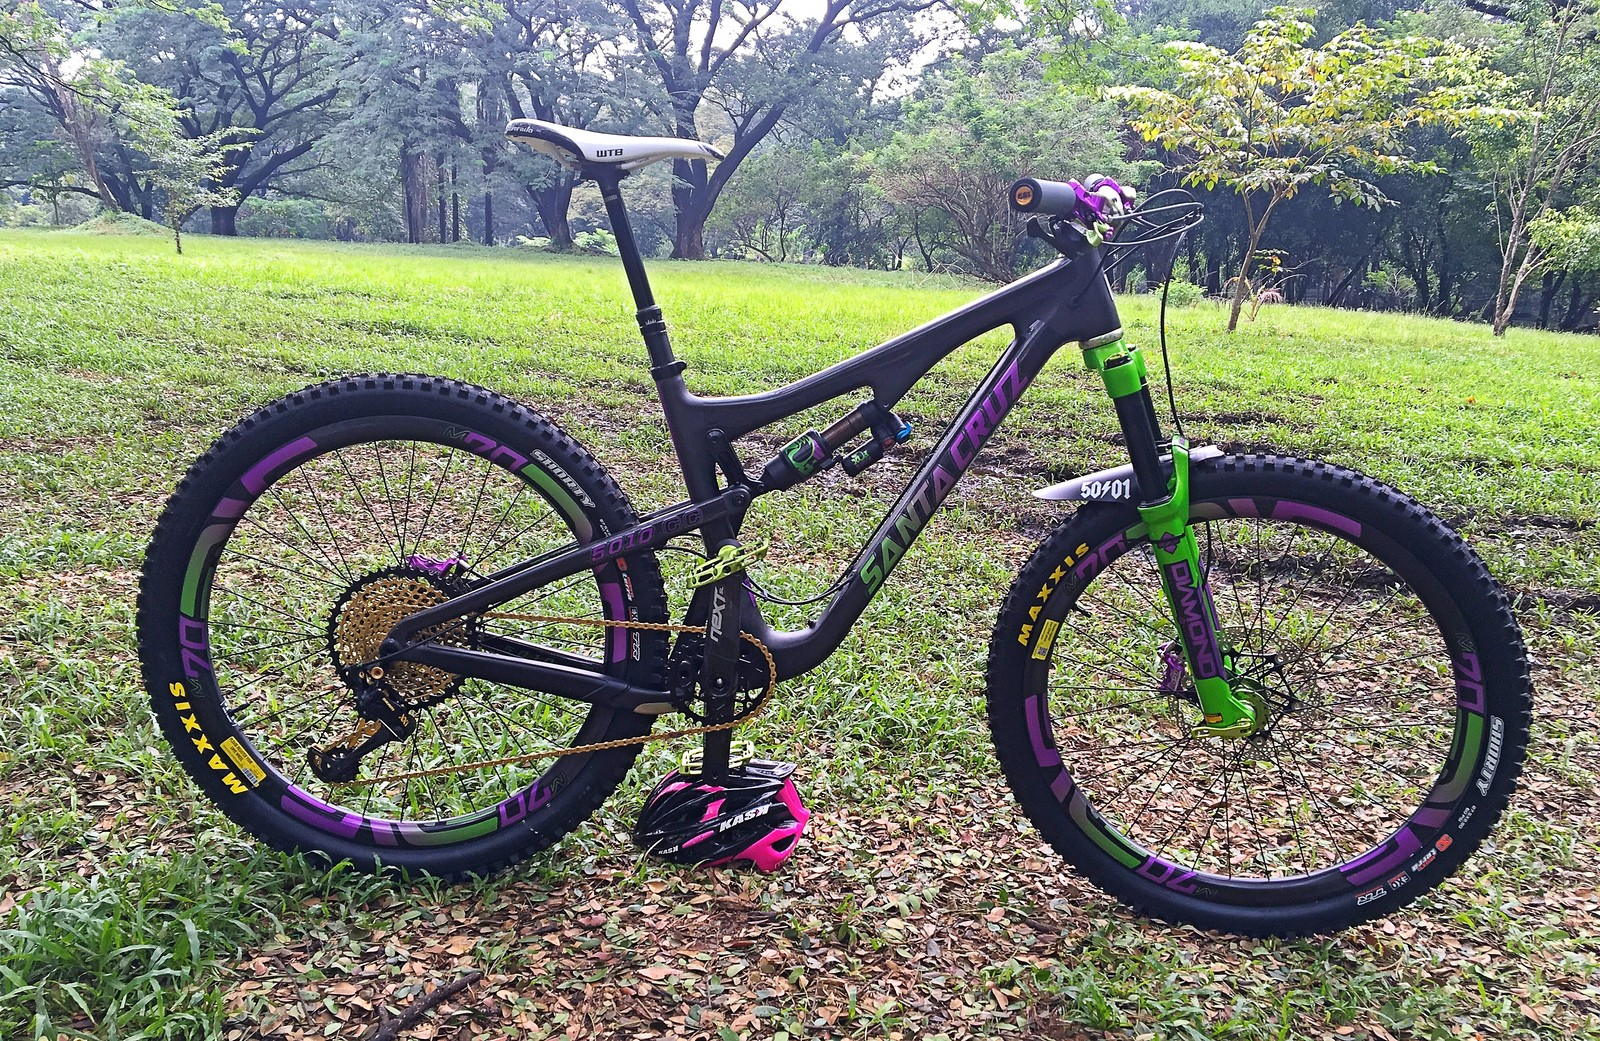 Custom Purple Green Santa Cruz 5010 Luigilizares77 S